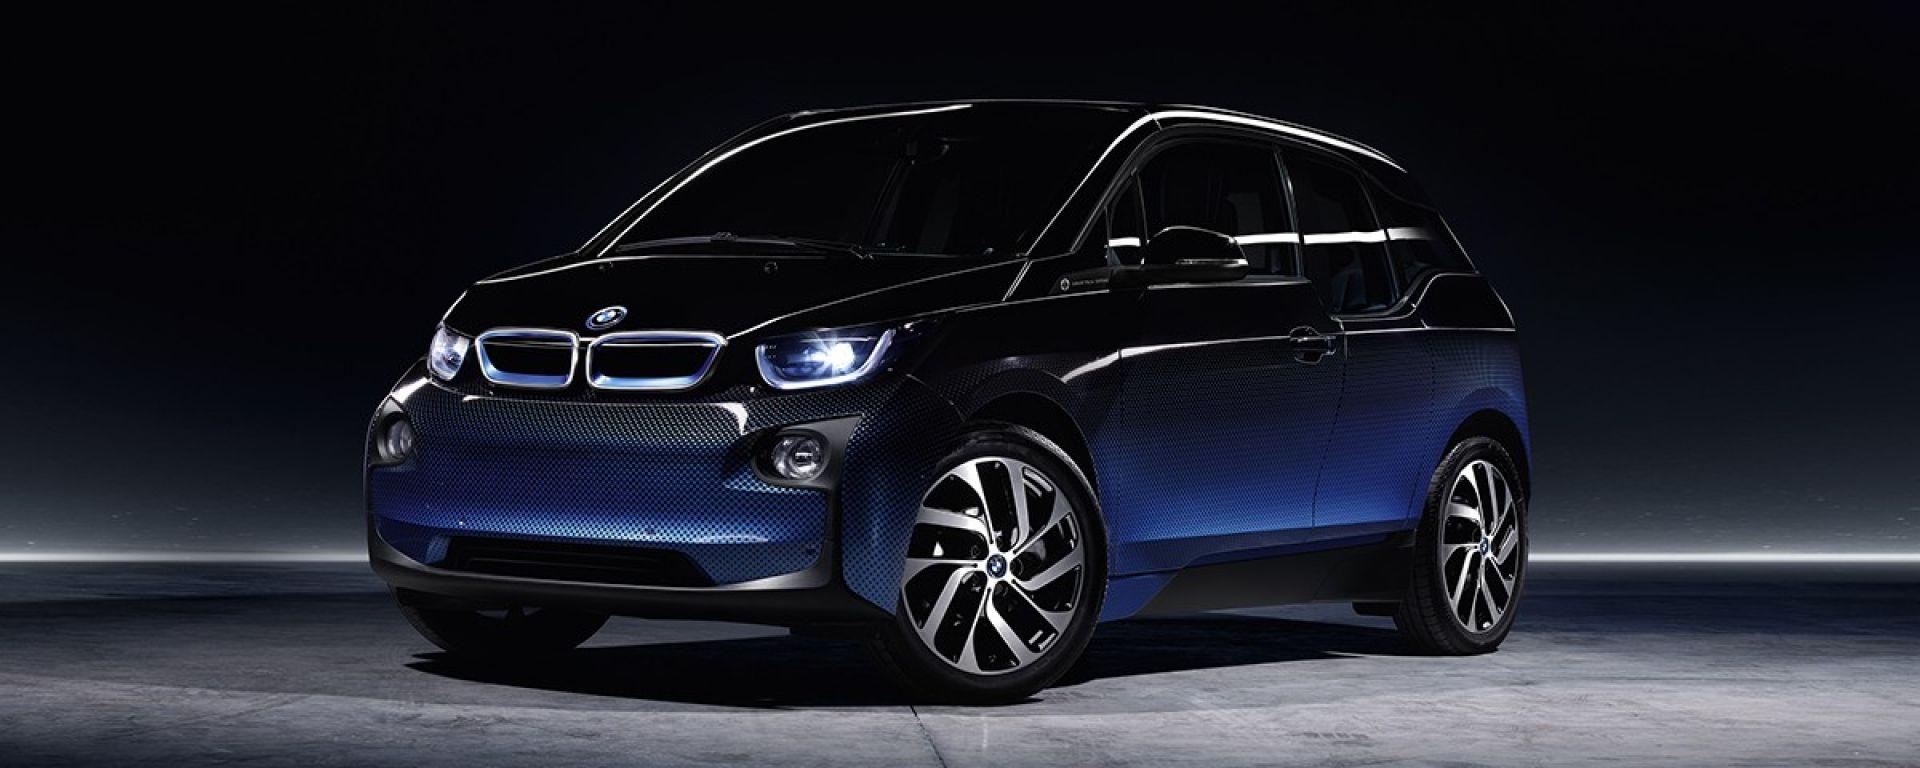 BMW i3 CrossFade Edition: l'ibrida più chic si ordina online